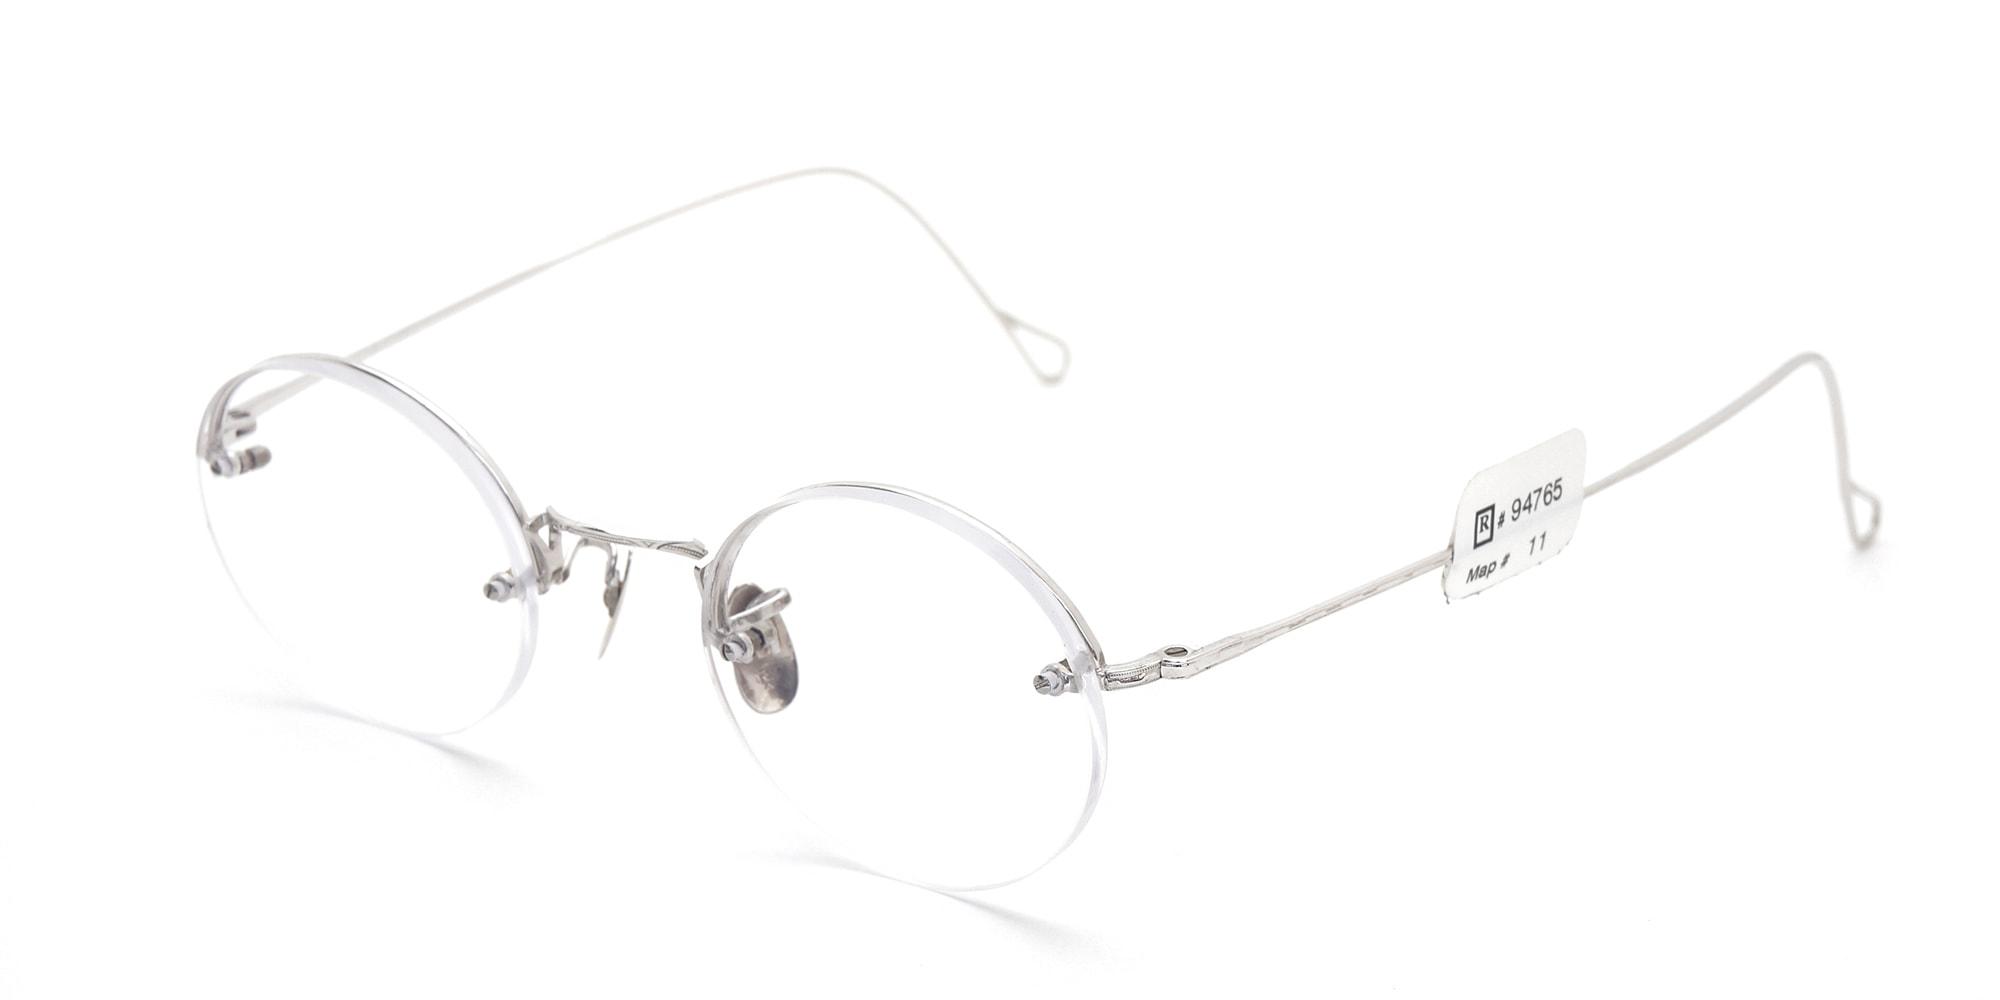 The Spectacle メガネ 1942年 SHURON Rimway Ful-Vue 1/10 12KGF 42-Long 2